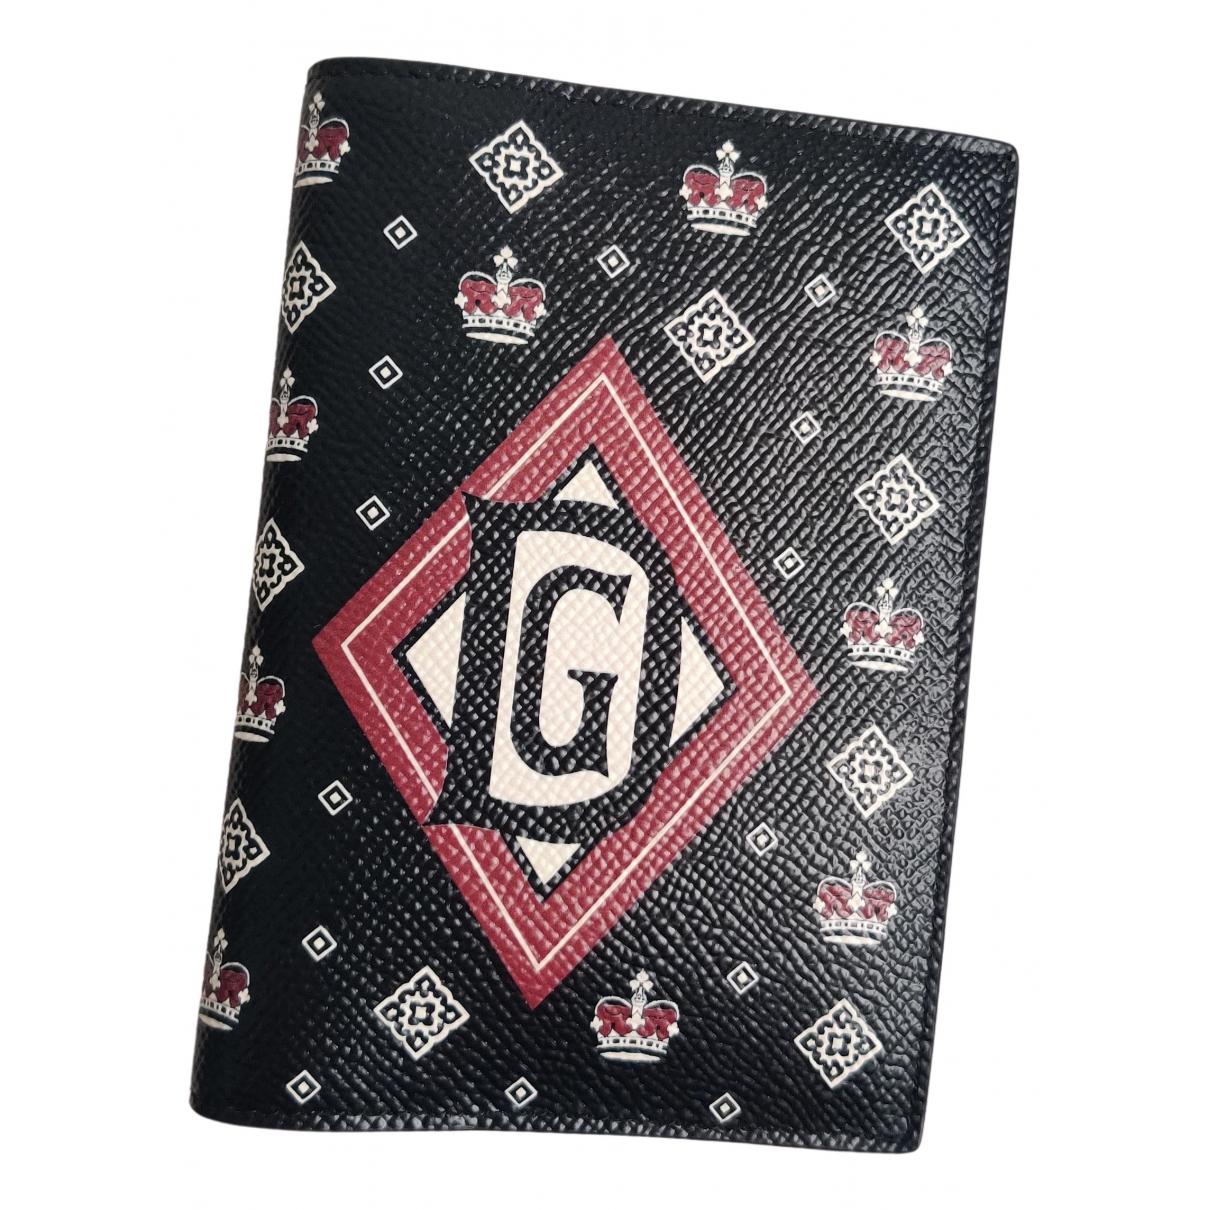 Dolce & Gabbana \N Kleinlederwaren in  Schwarz Leder